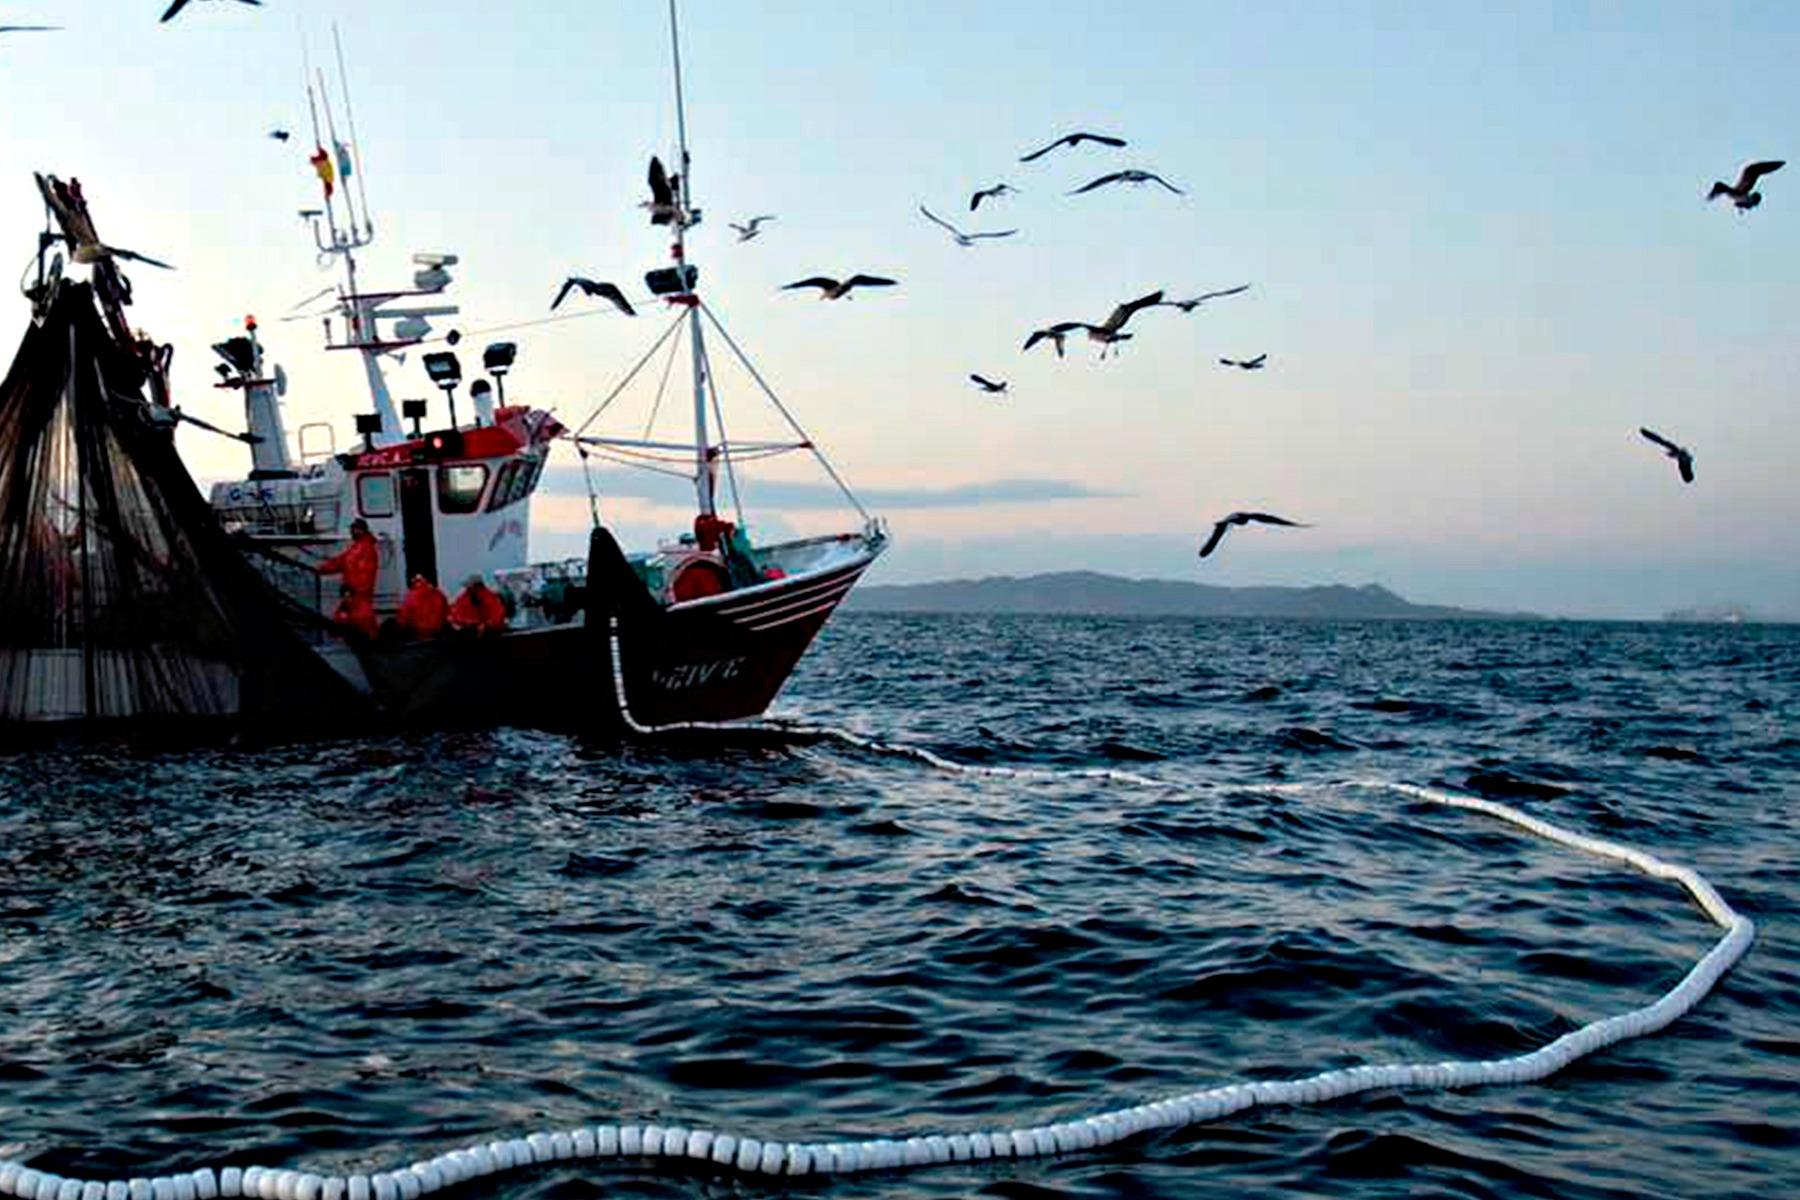 Resultado de imagen para pesca comercial golfo de california